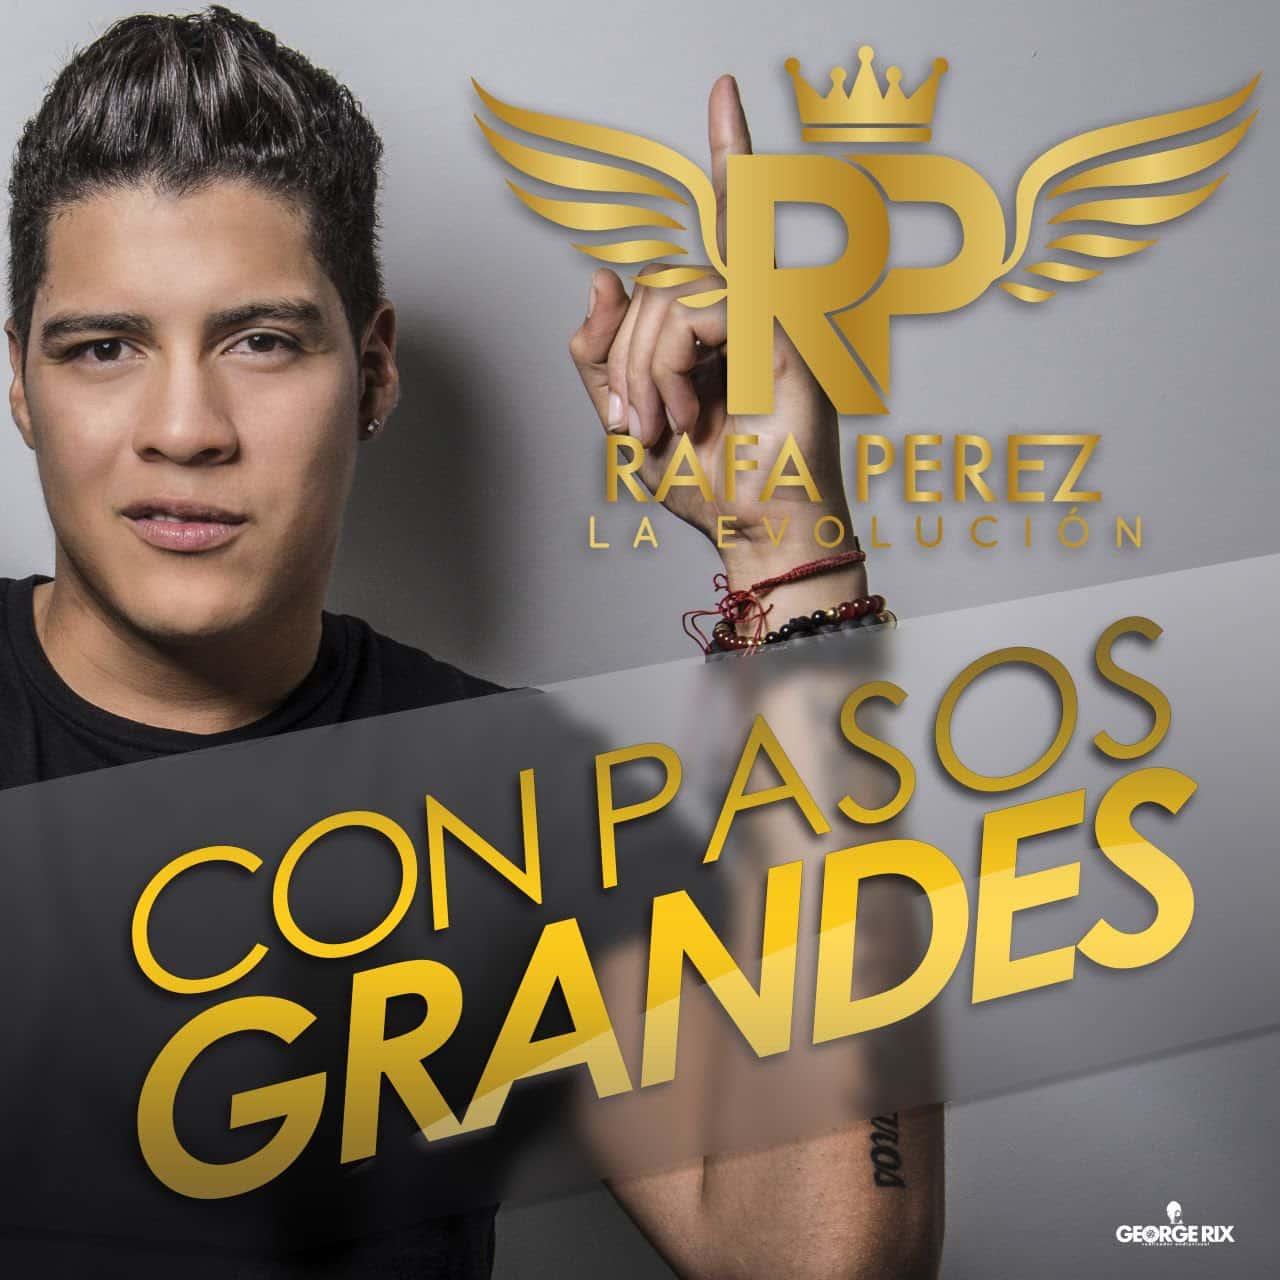 Rafa Pérez con grandes pasos